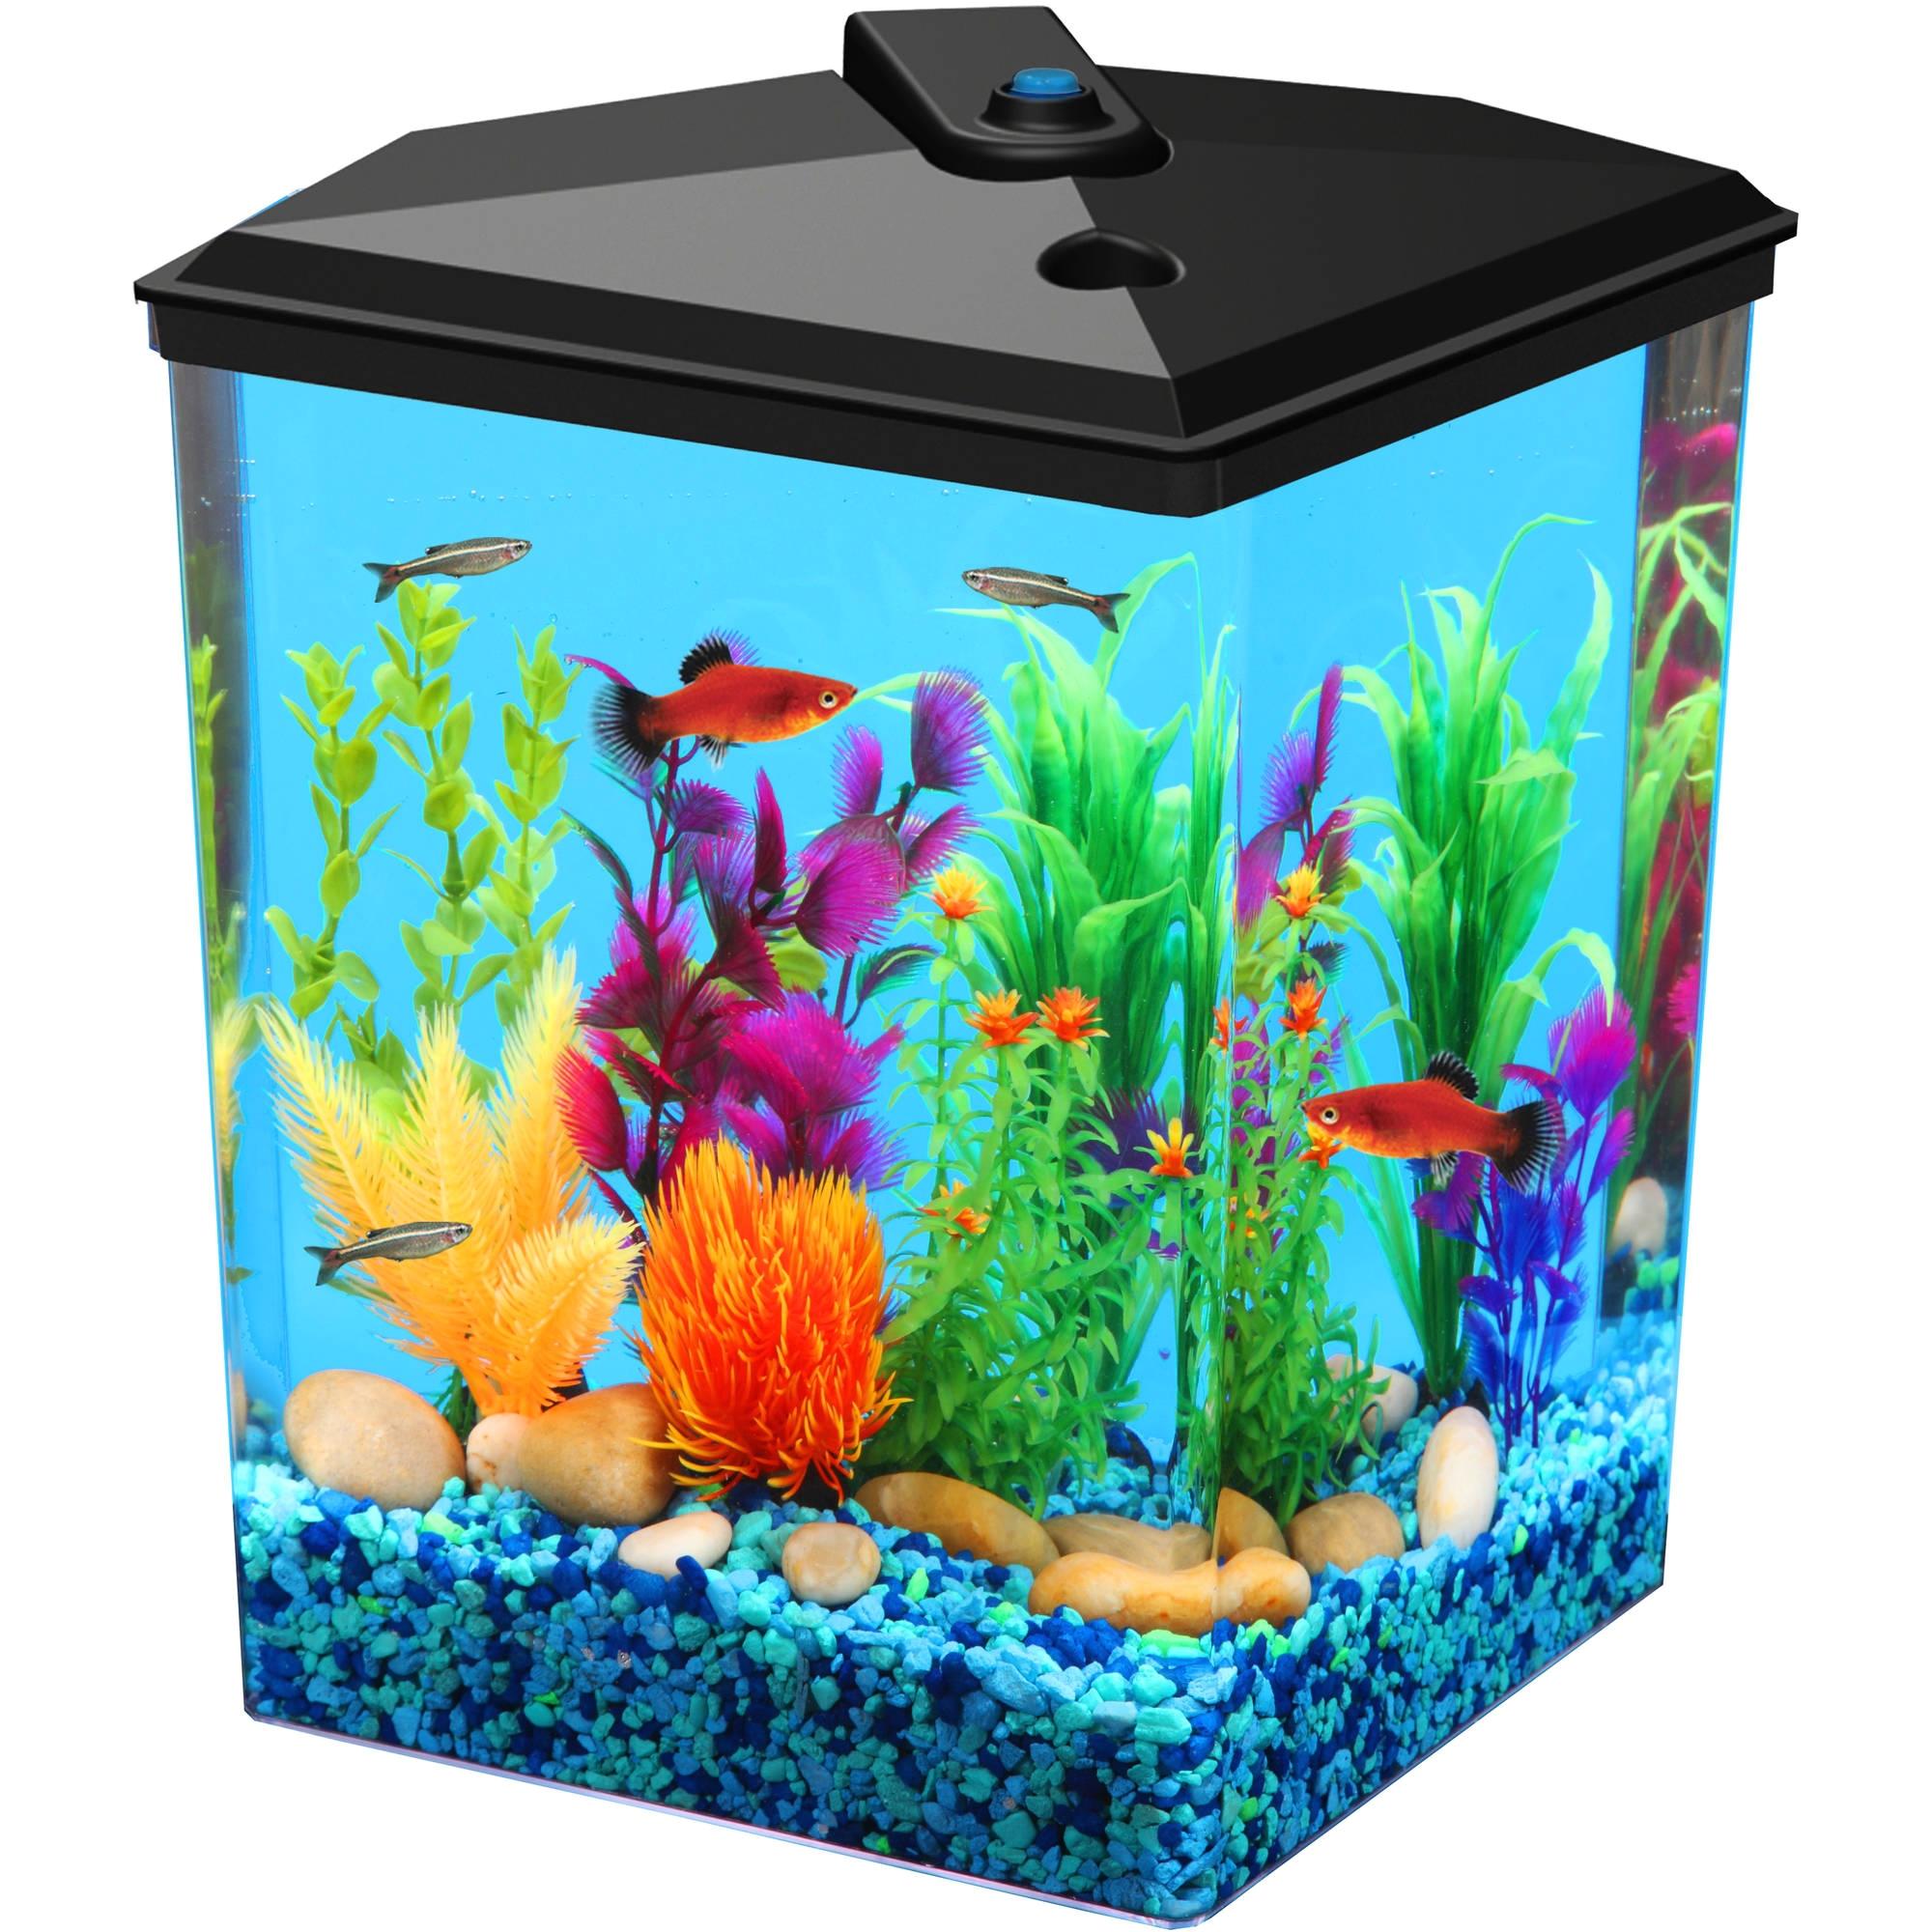 Star Wars Fish Tank Decor Penn Plax Cascade 300 Internal